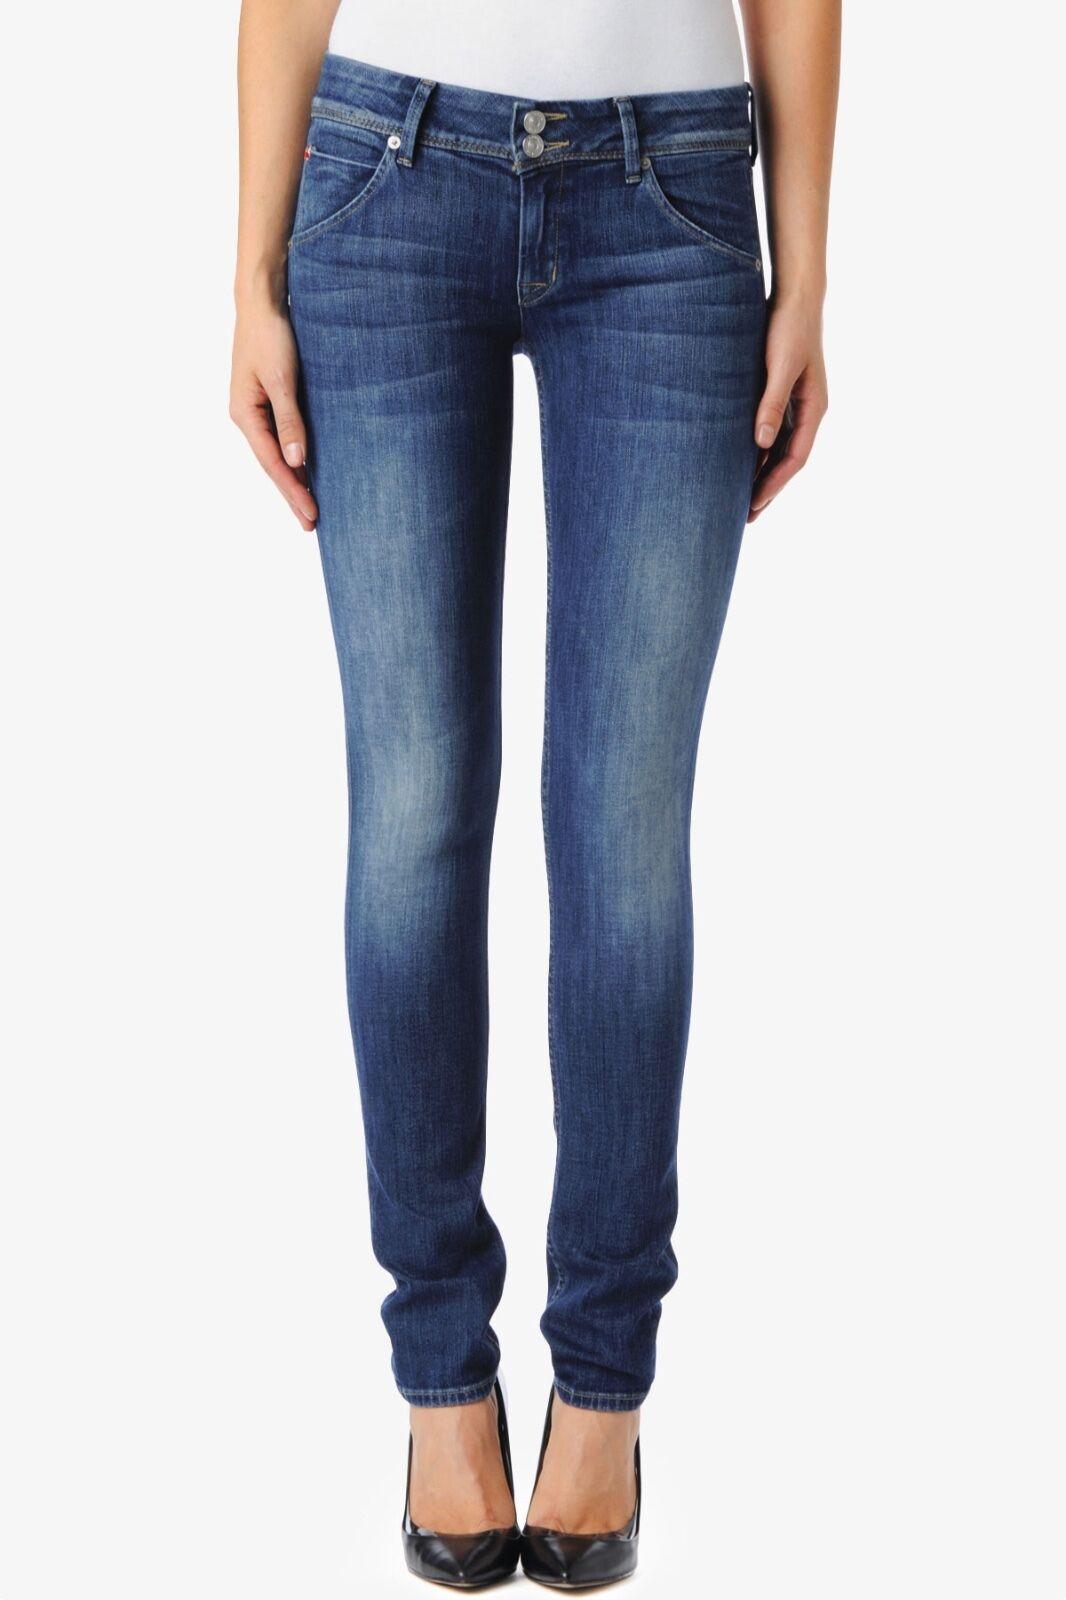 Hudson Collin Faded Skinny Jeans 24 NWT W422LDES Super Vixen